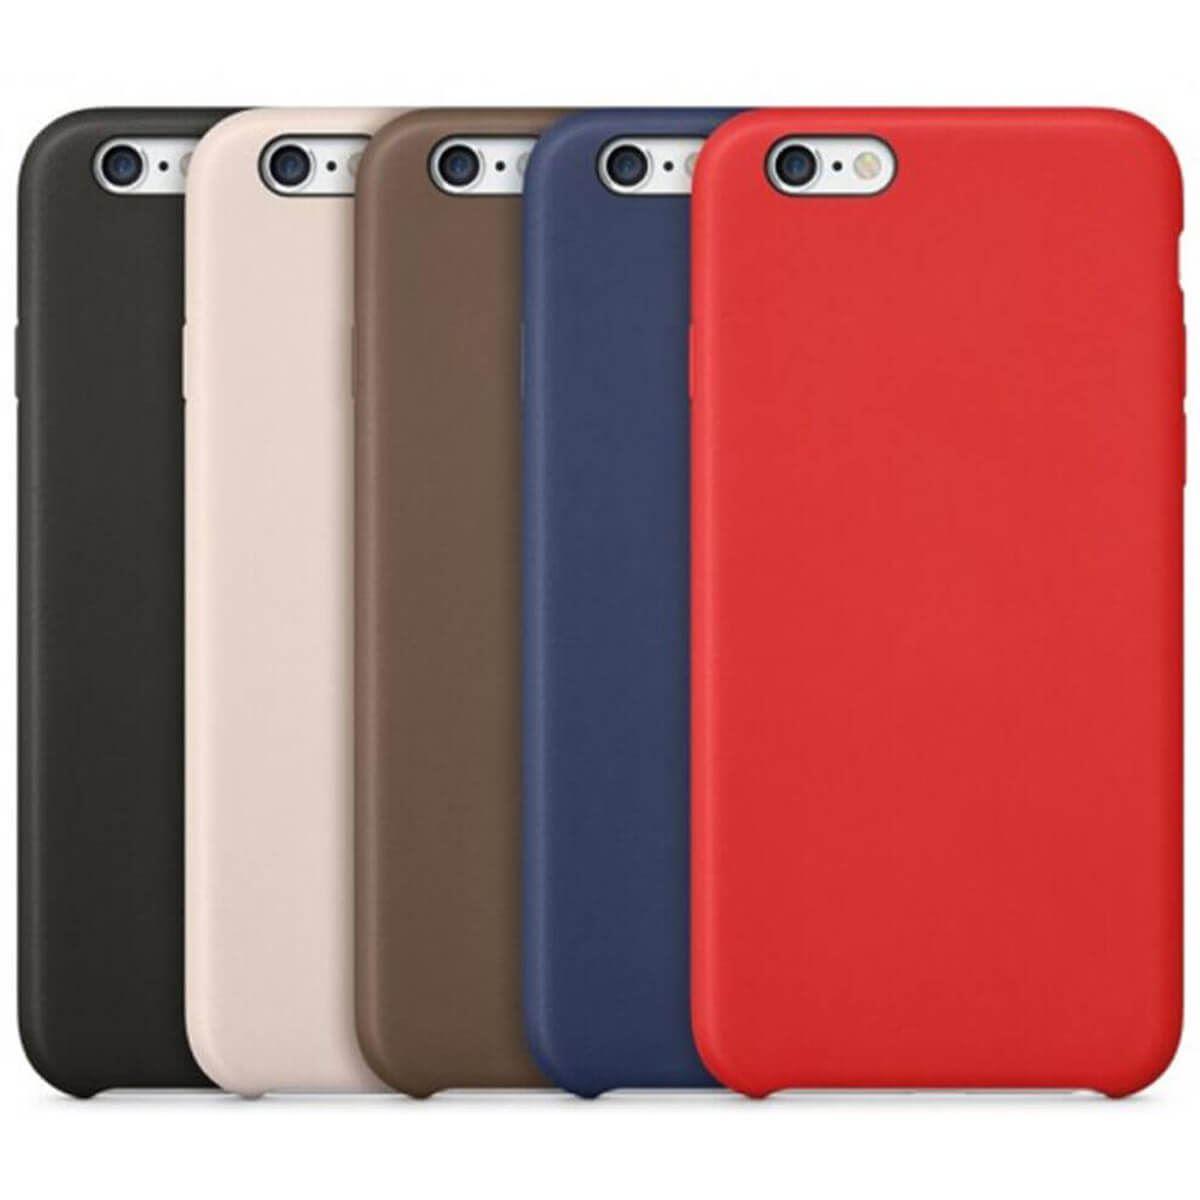 Leather-Slim-Case-Apple-iPhone-10-8-7-Plus-6s-5-Original-PU-Soft-Silicone-Cover thumbnail 6